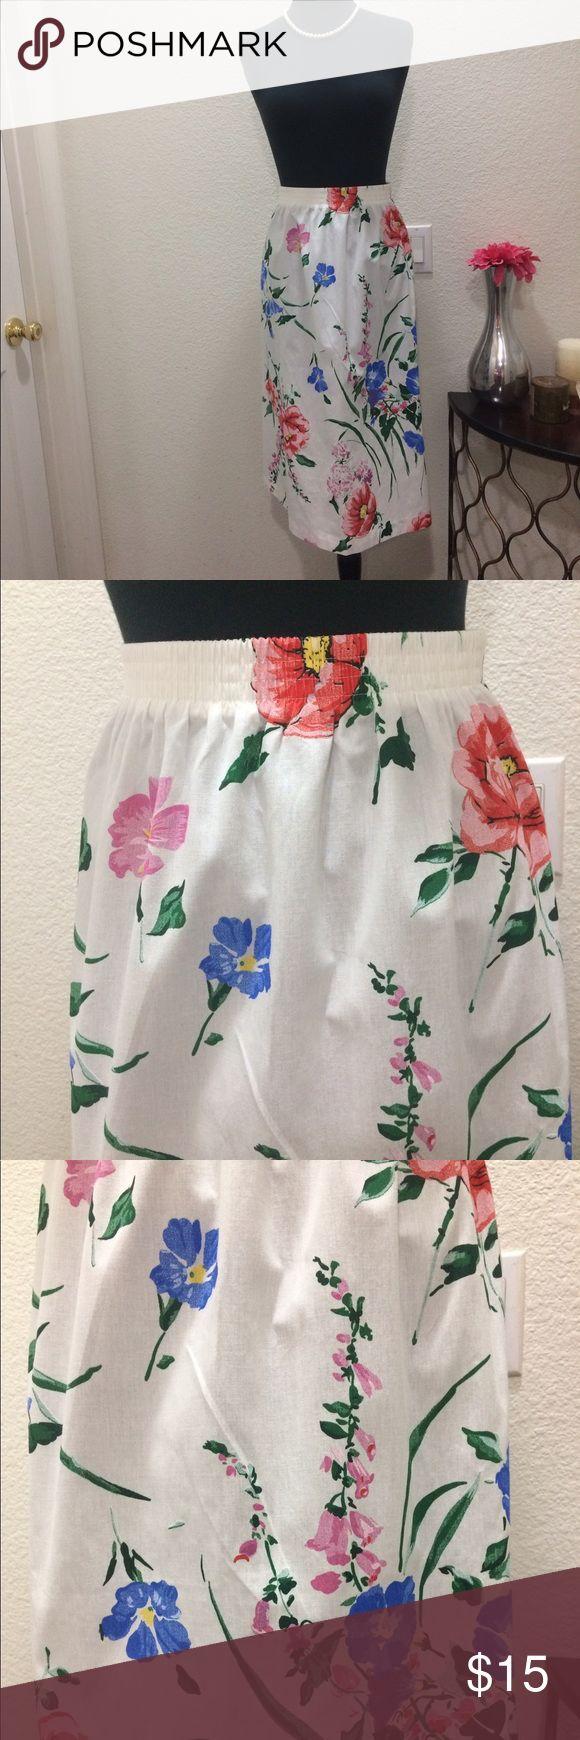 "Vintage Plus size floral🌺🍃print Skirt Vintage floral print 🌺🍃 Skirt by Village Fair, size XL, machine washable, measurements across laying flat, waist: 15 1/2"" - 20"" (elastic), Hips: 26"", Length: 27"", EUC, Flawless mint condition Village Fair Skirts"